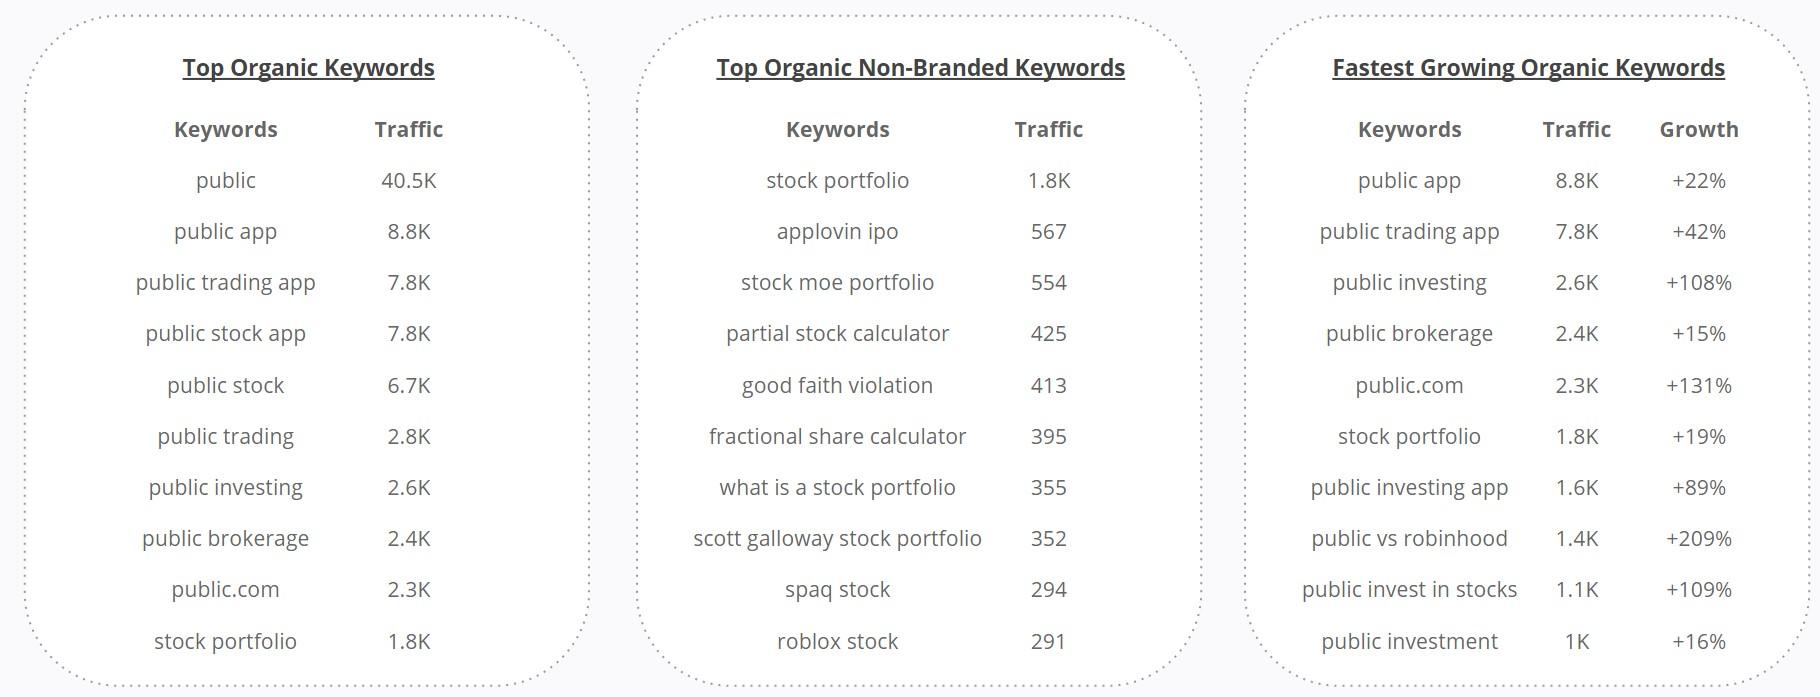 Public.com - Organic Search Top Keyword Searches